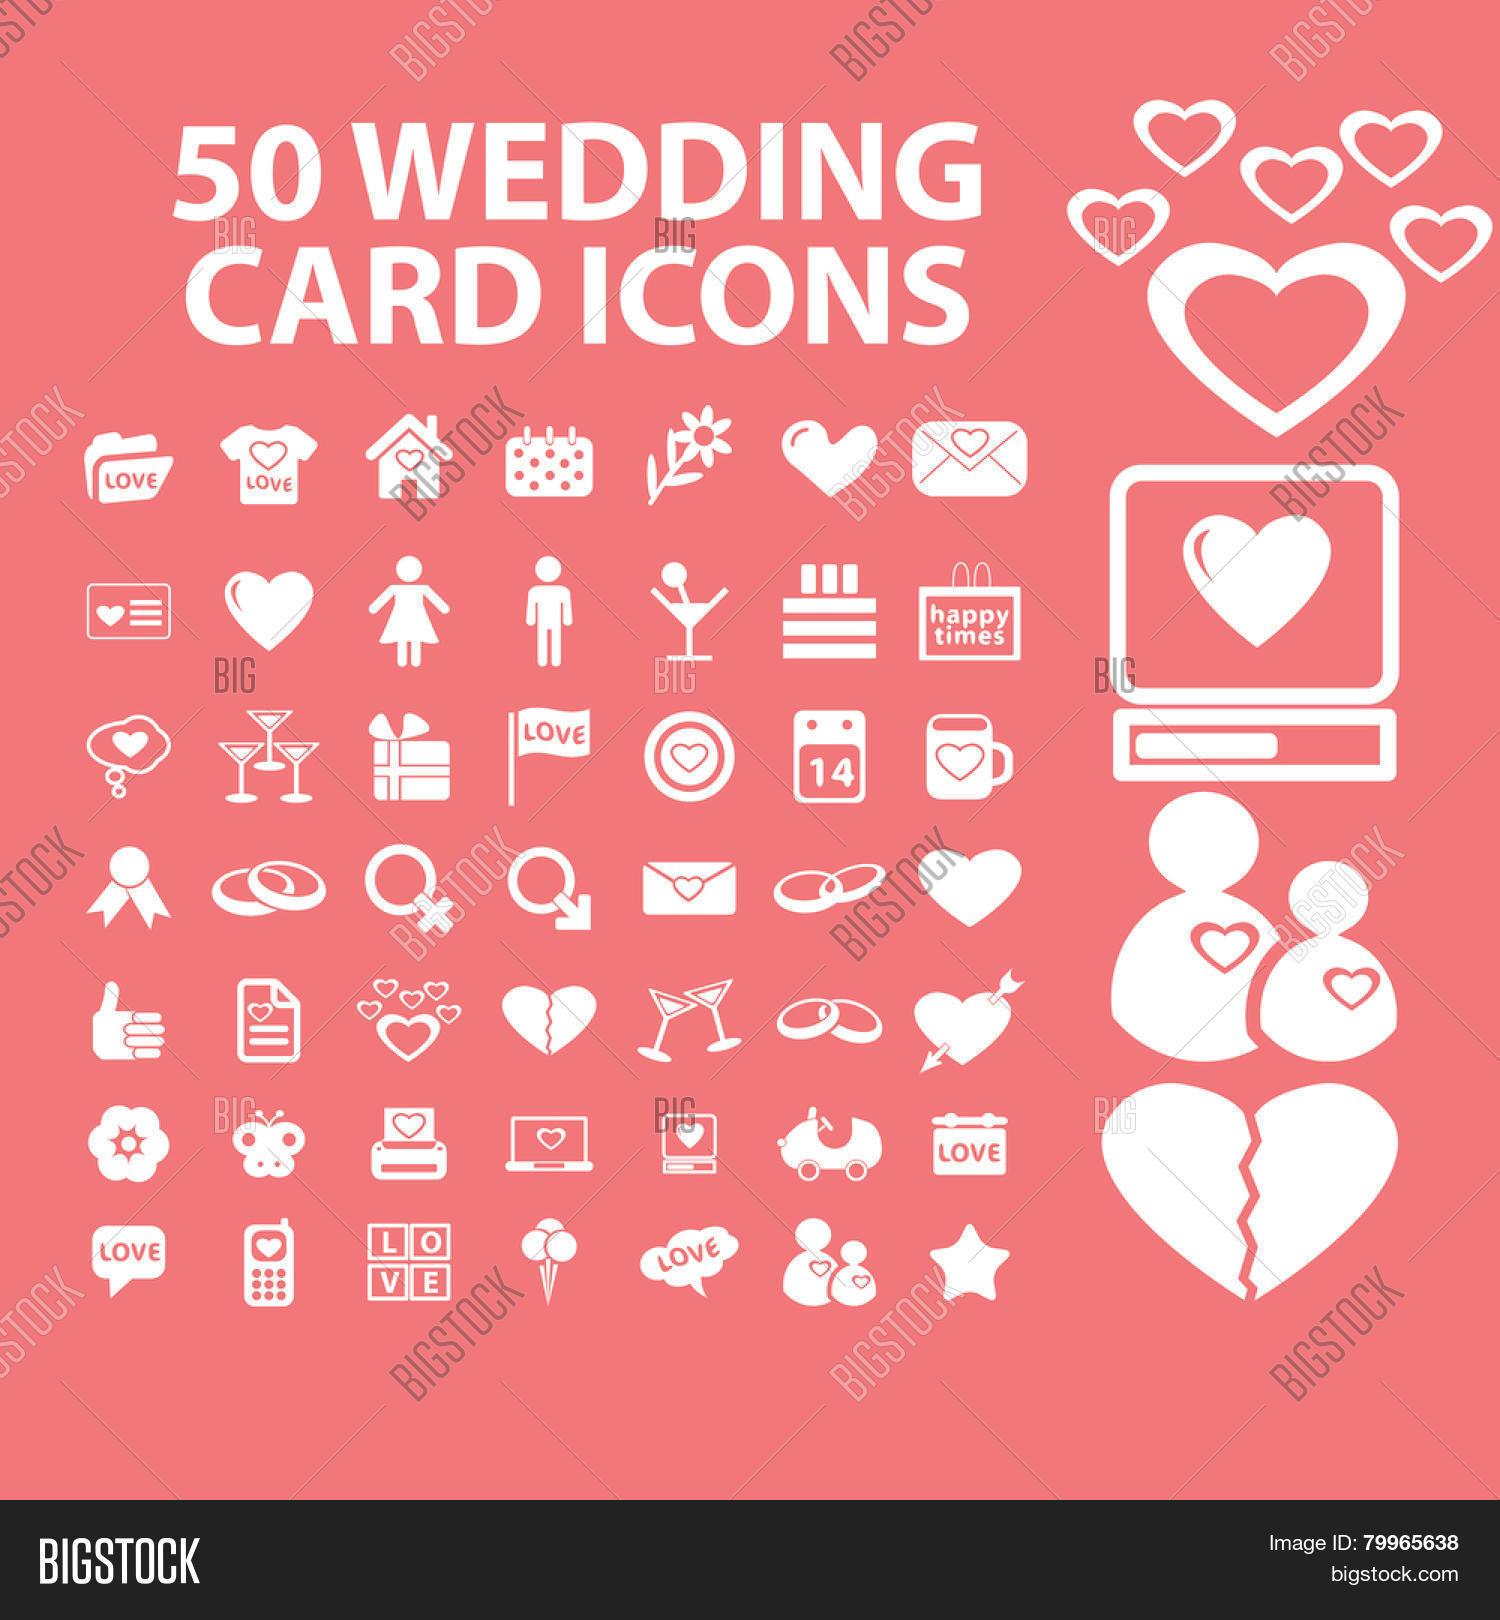 50 Wedding Card Vector Photo Free Trial Bigstock